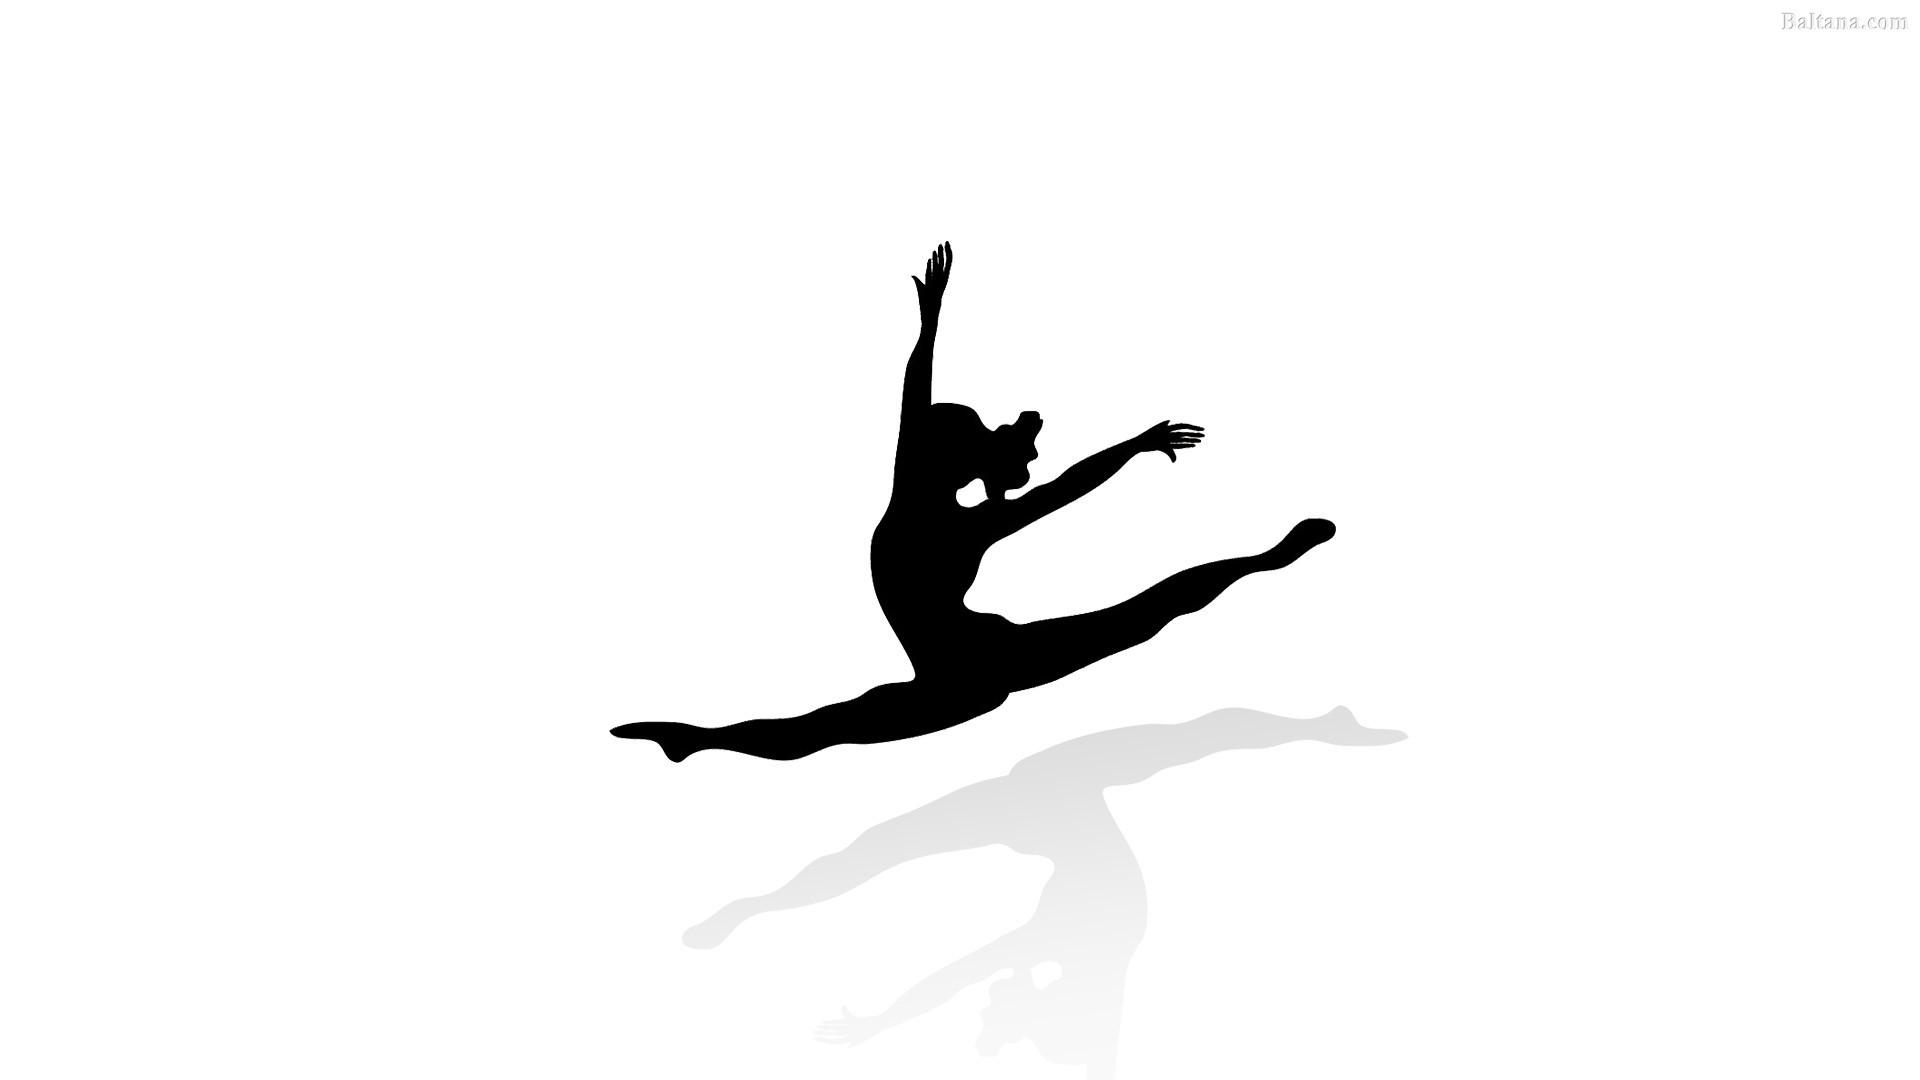 Gymnastics Backgrounds 64 images 1920x1080